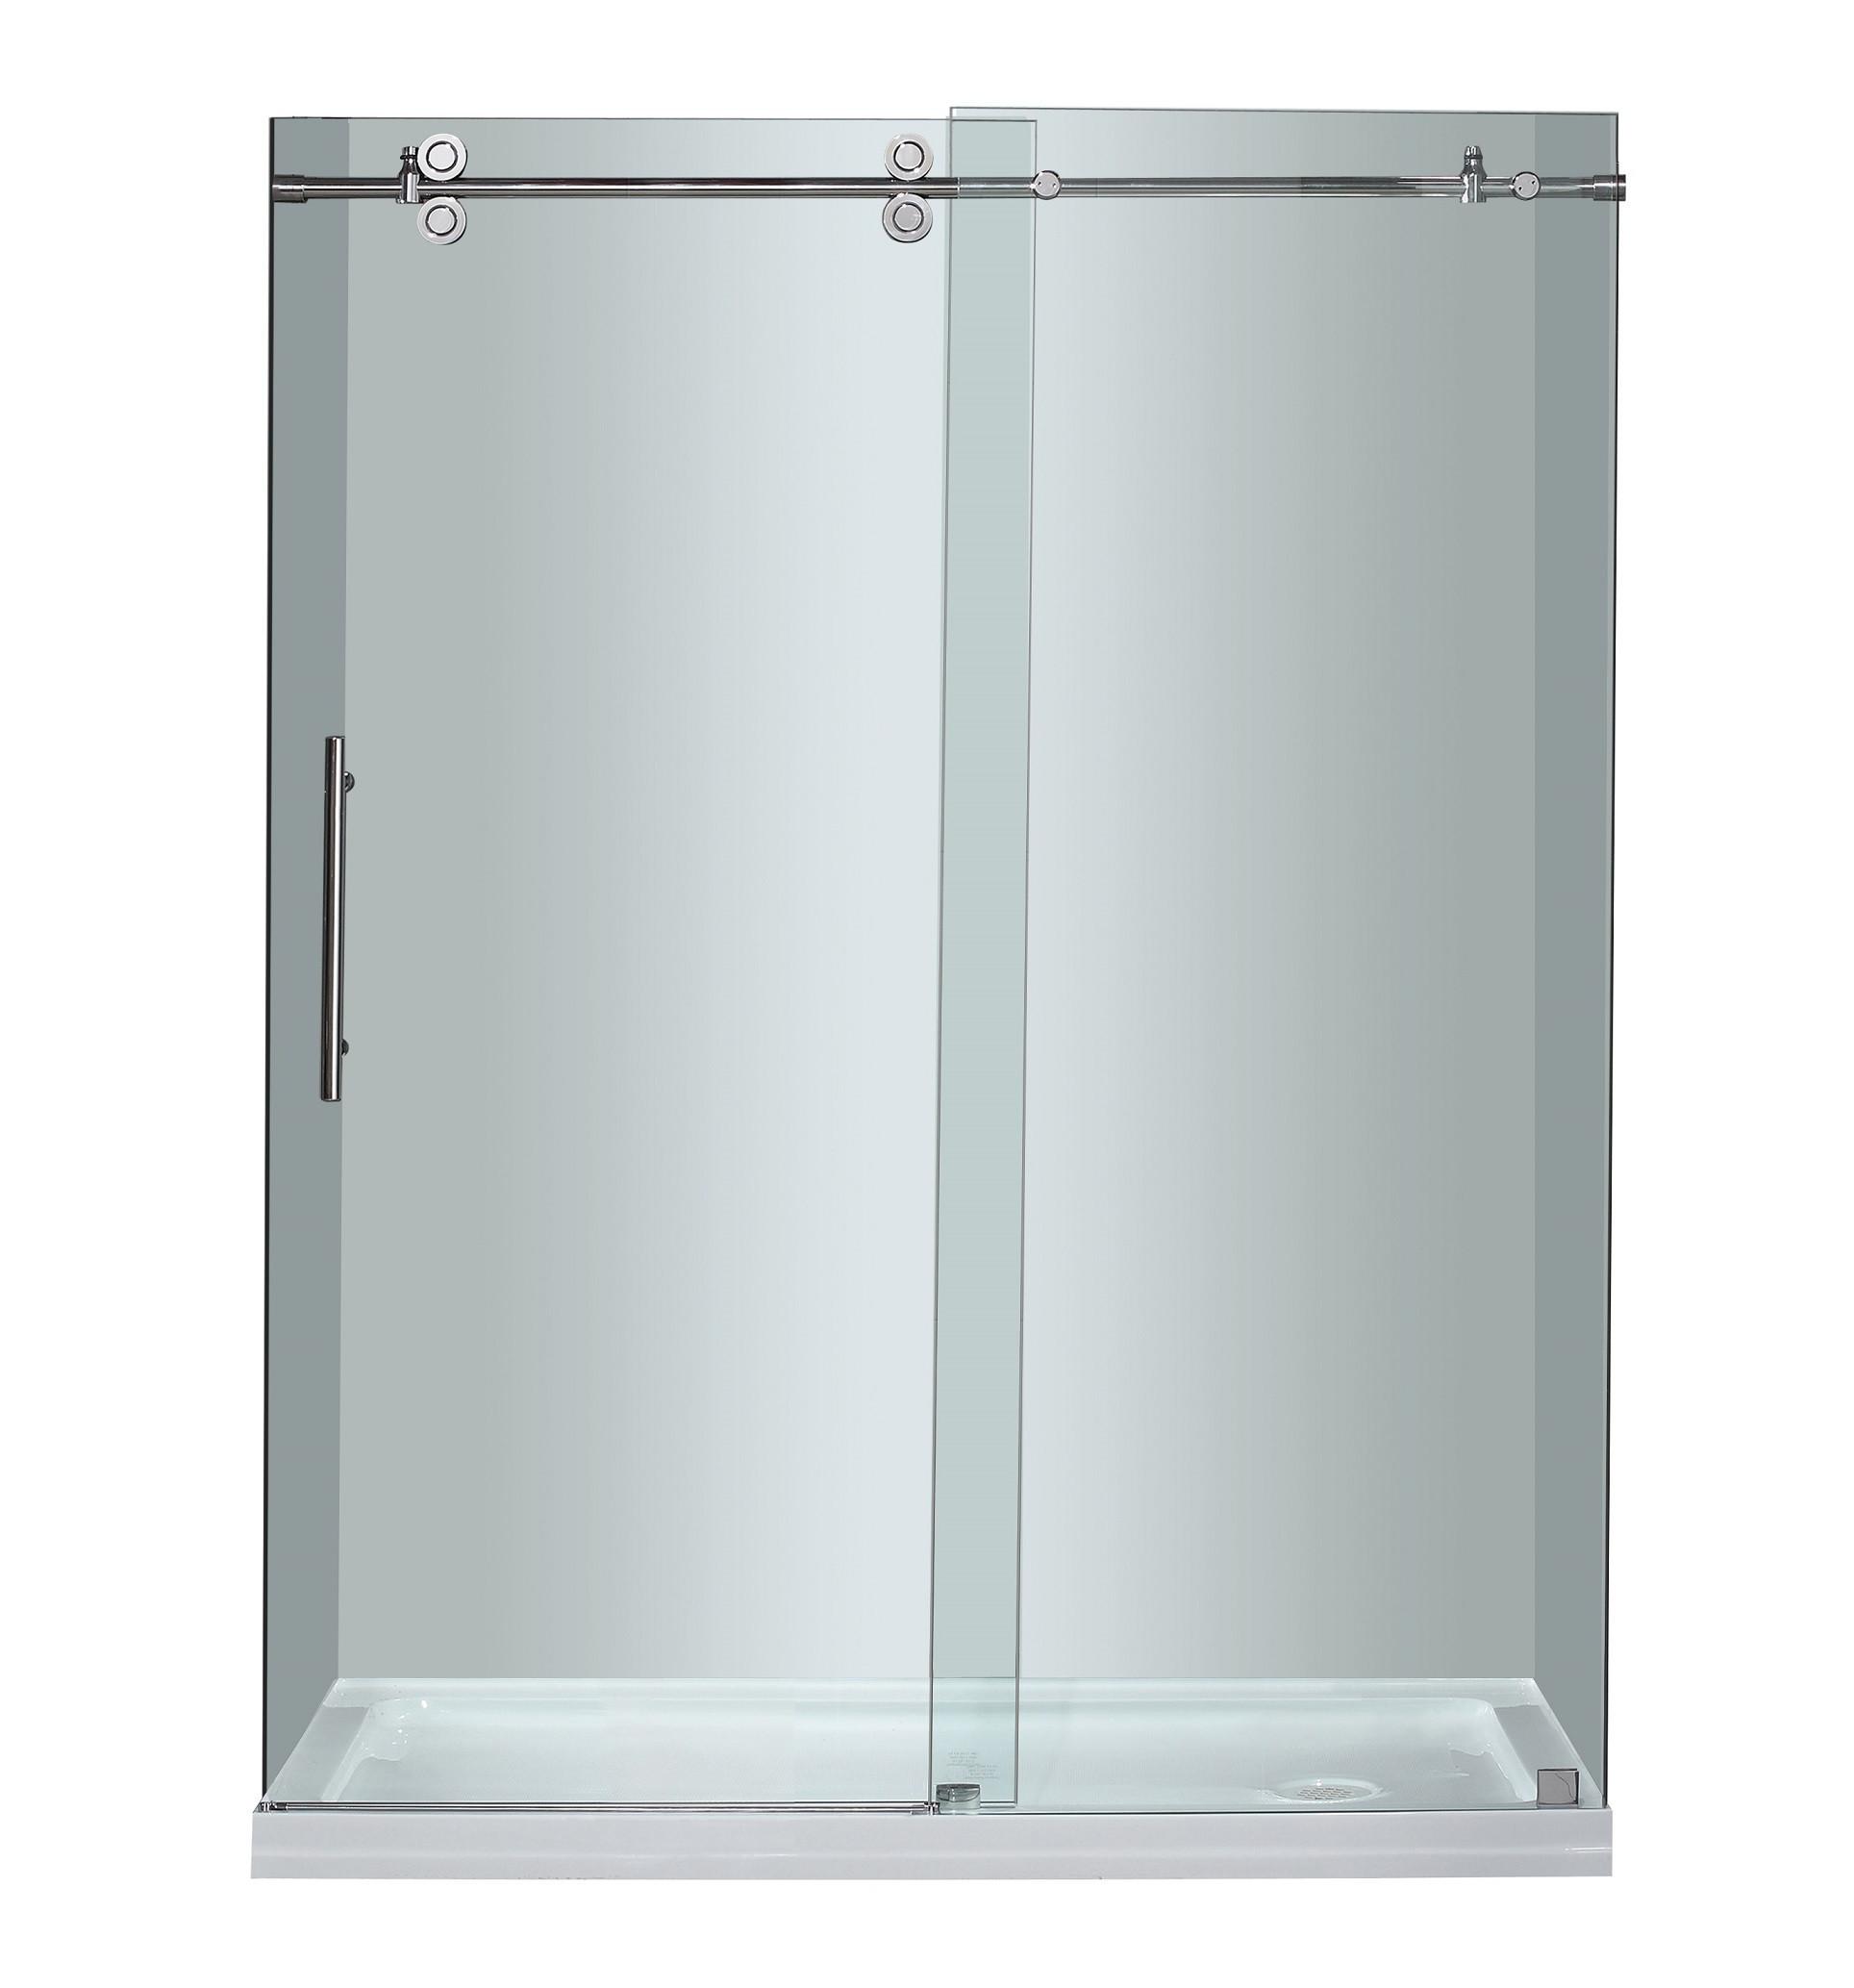 Aston Global SDR978-TR-CH-60-10-R - Completely Frameless Sliding Shower Door with Right Shower Base